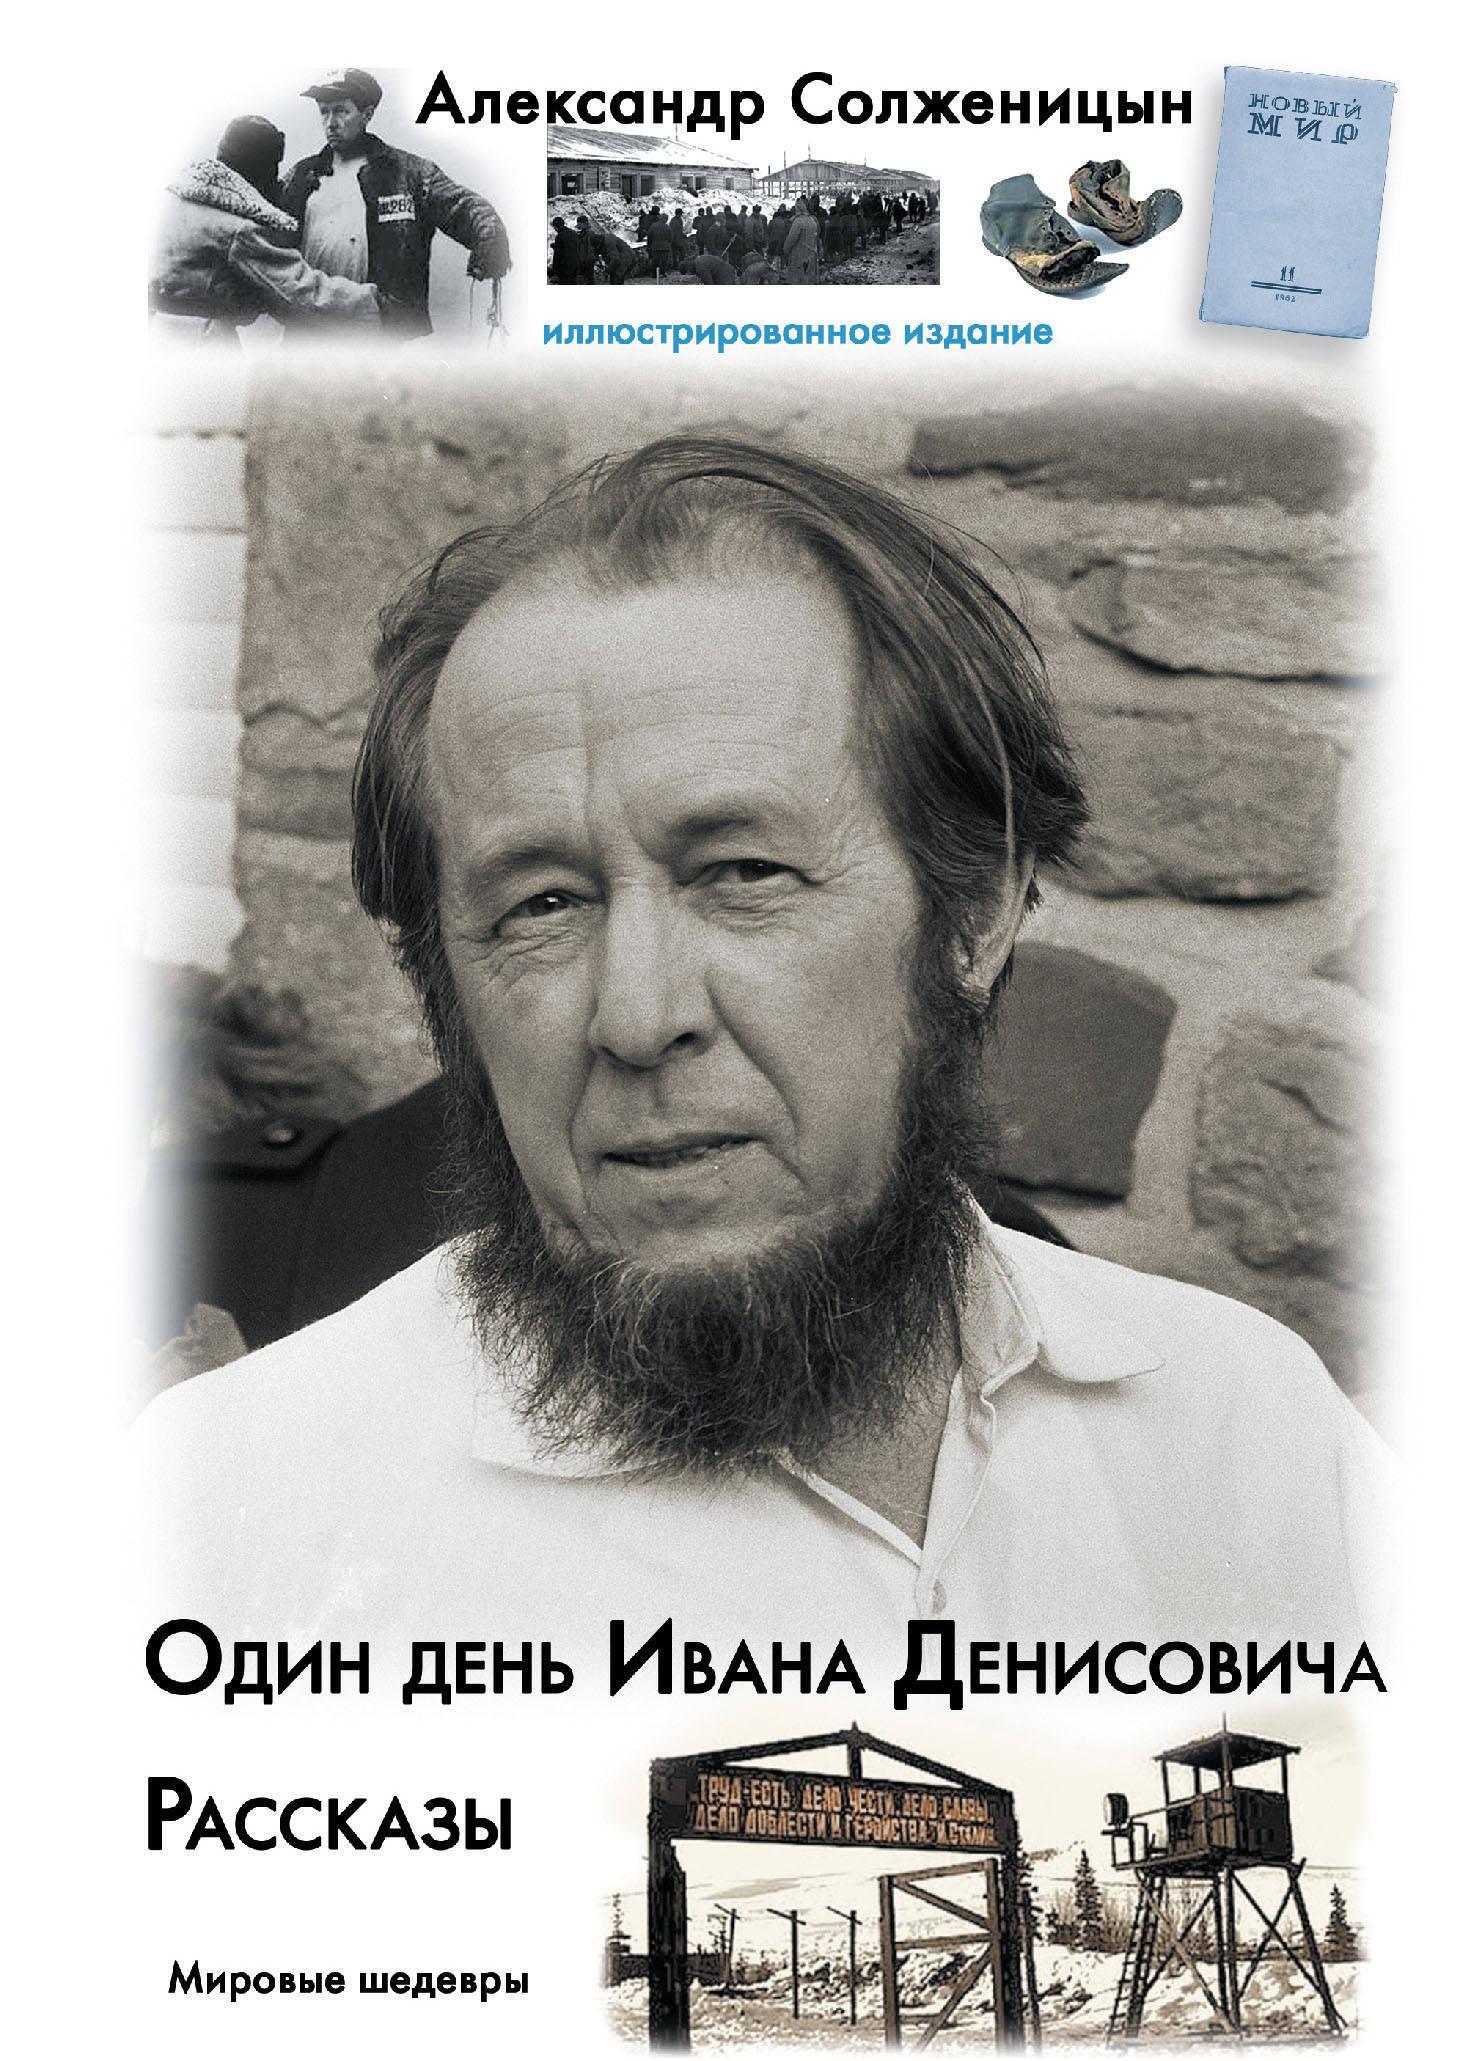 Odin den Ivana Denisovicha. Rasskazy